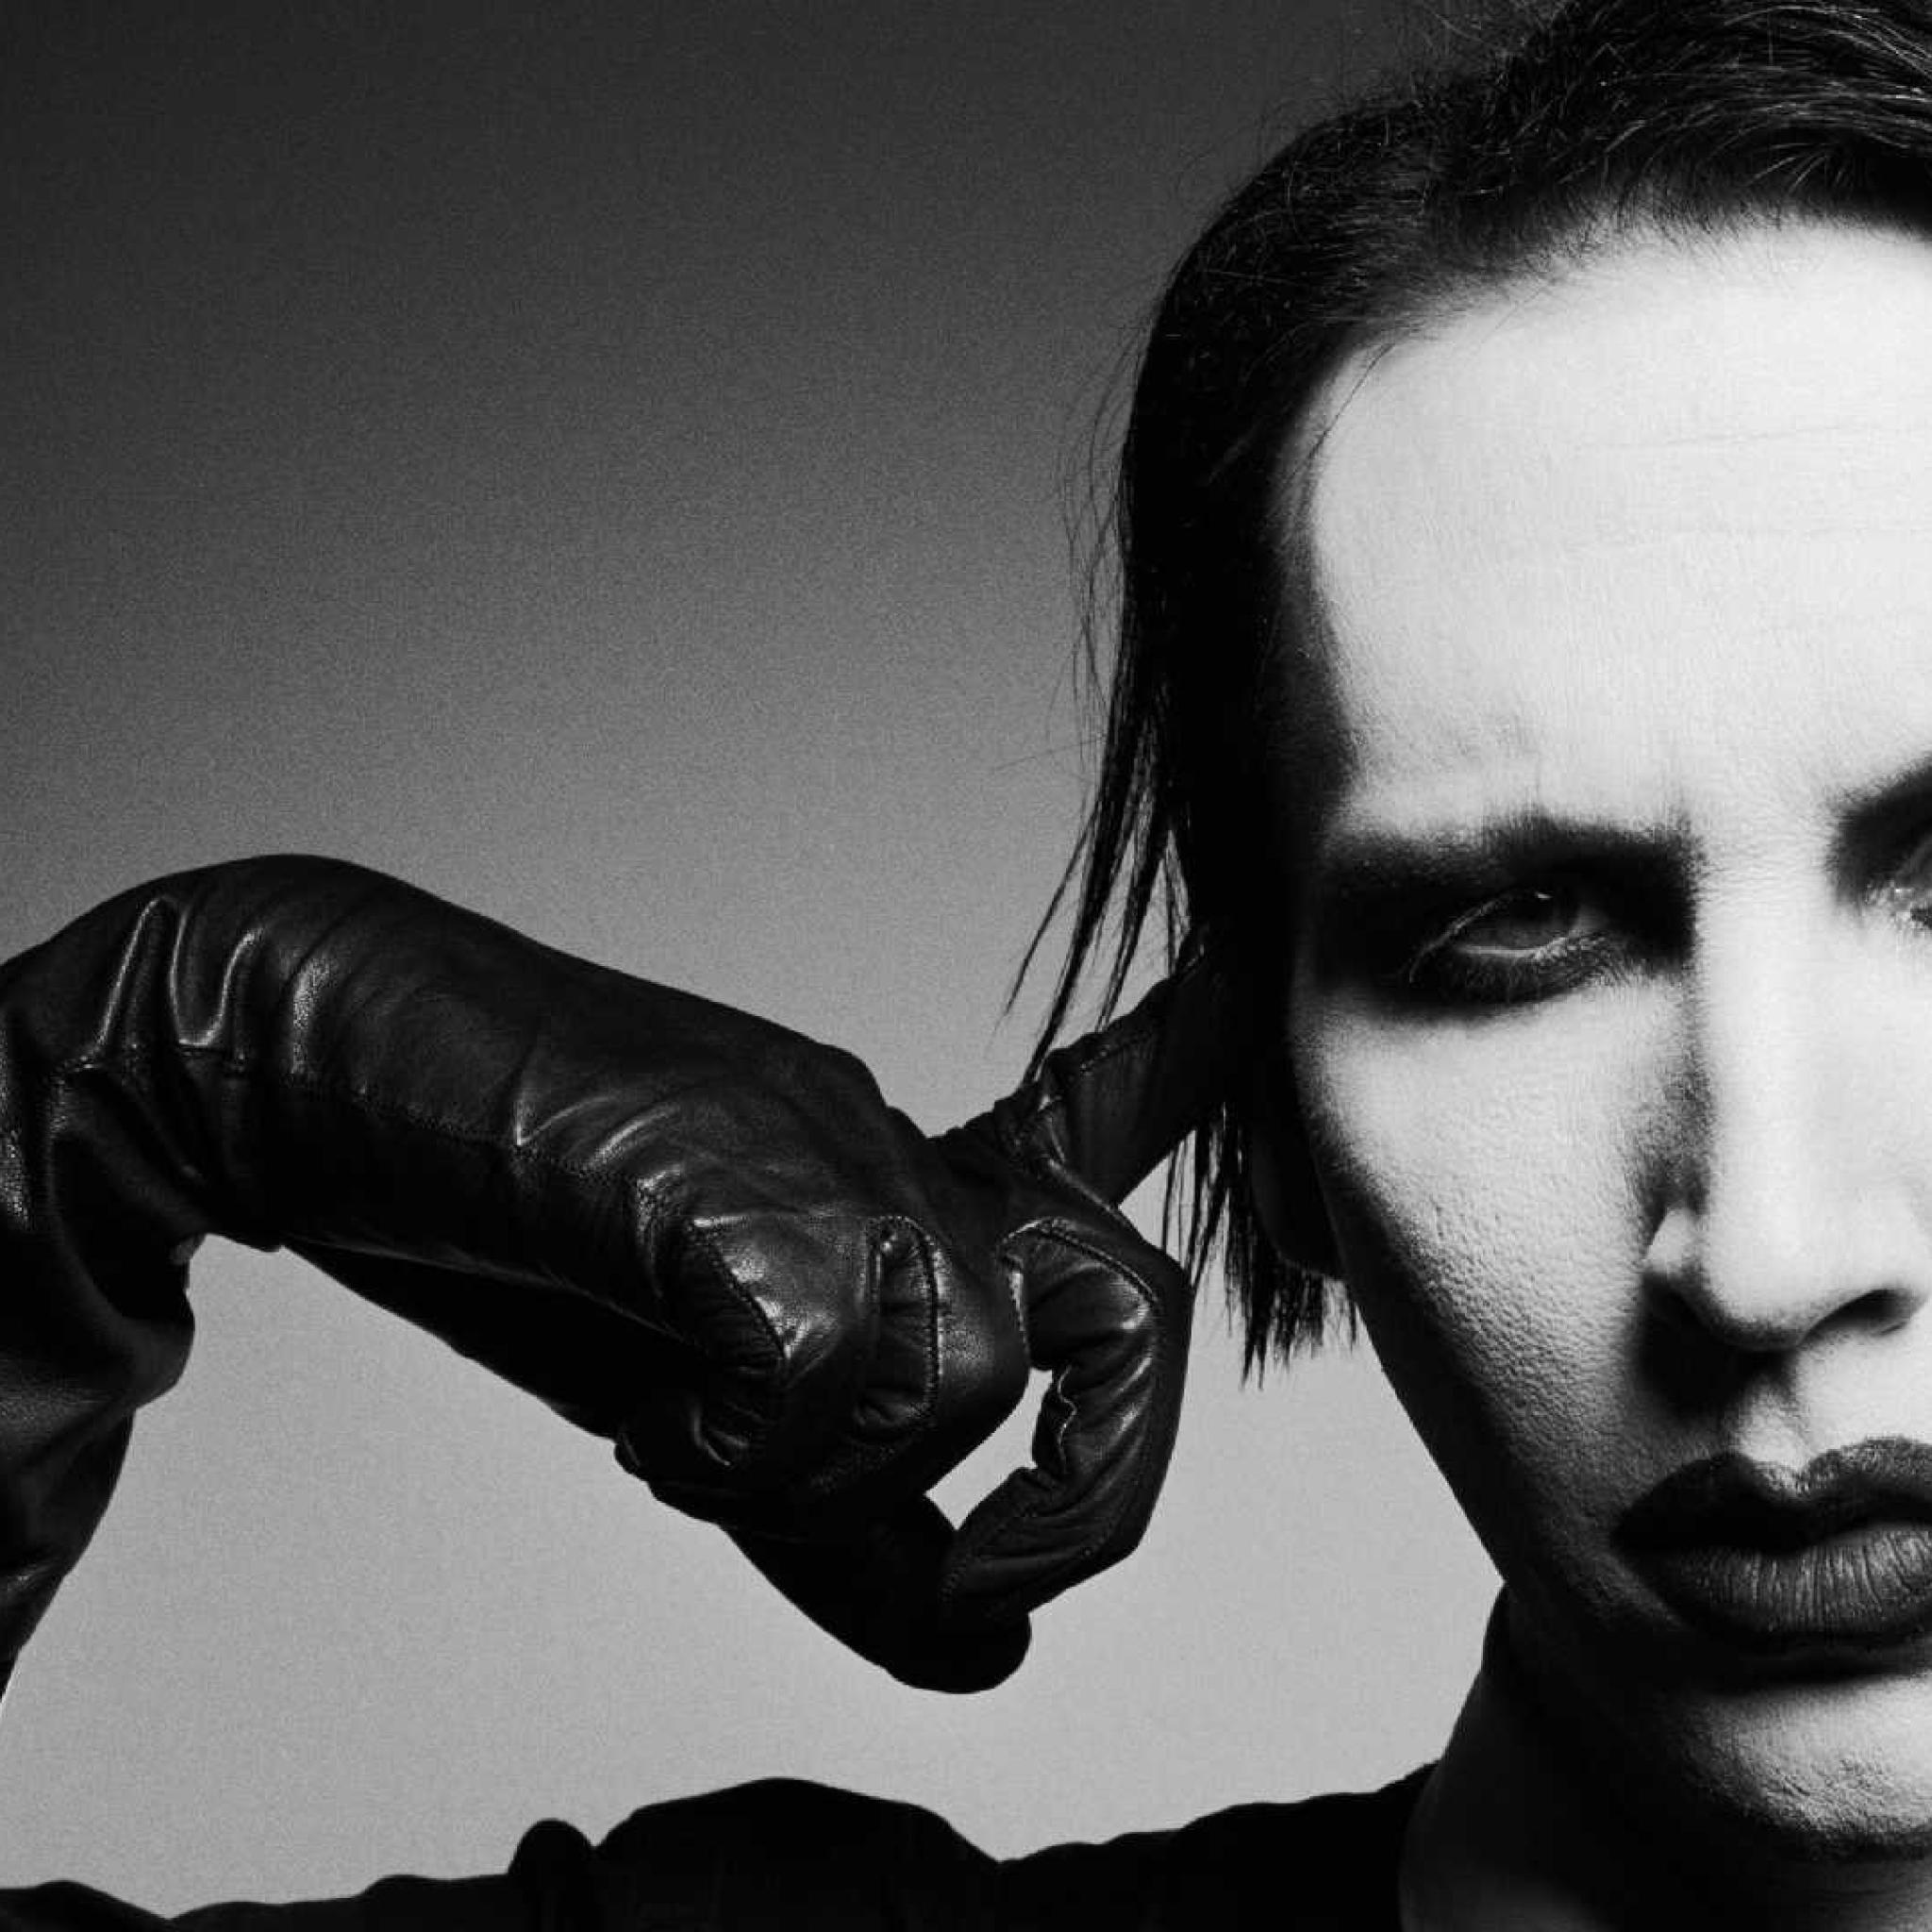 2048x2048 Marilyn Manson Face Makeup Ipad Air Wallpaper Hd